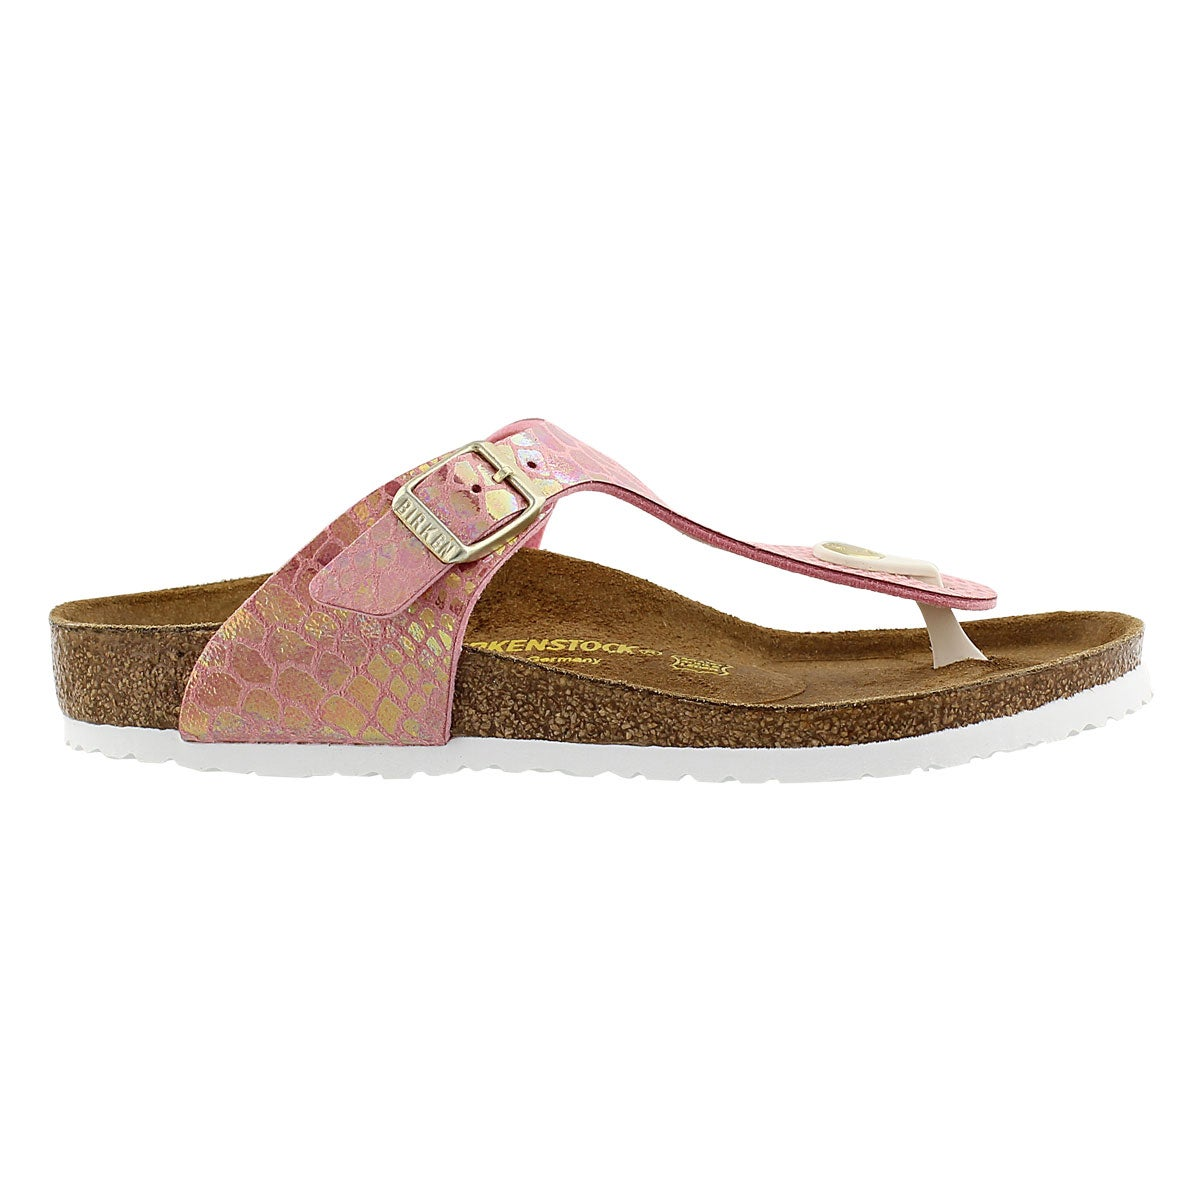 Grls Gizeh shiney snake rose sandal-Narr